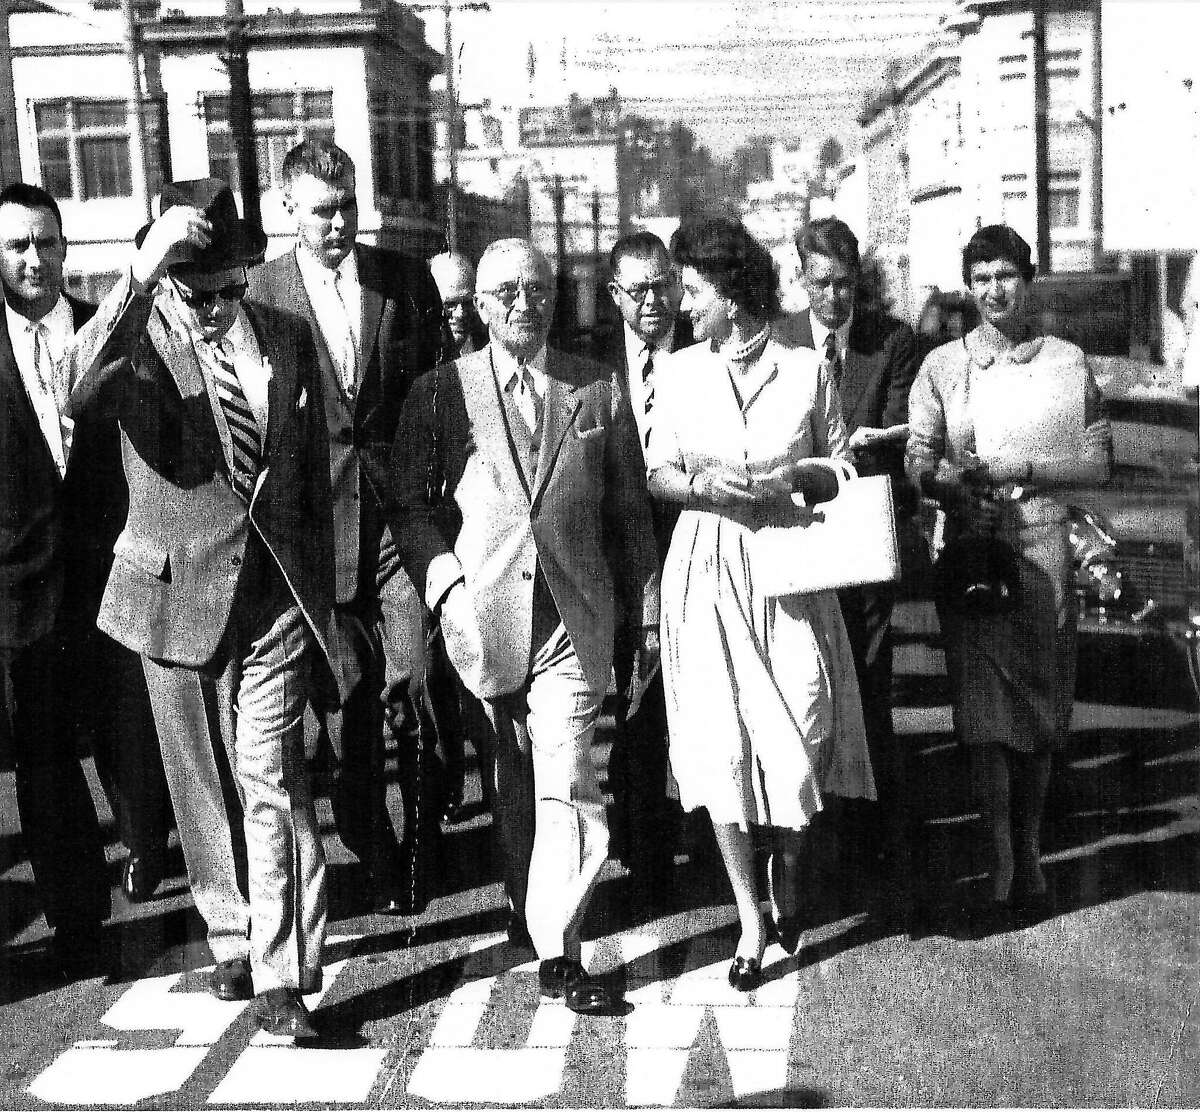 Ann Eliaser walks with President Harry Truman in an undated photo.